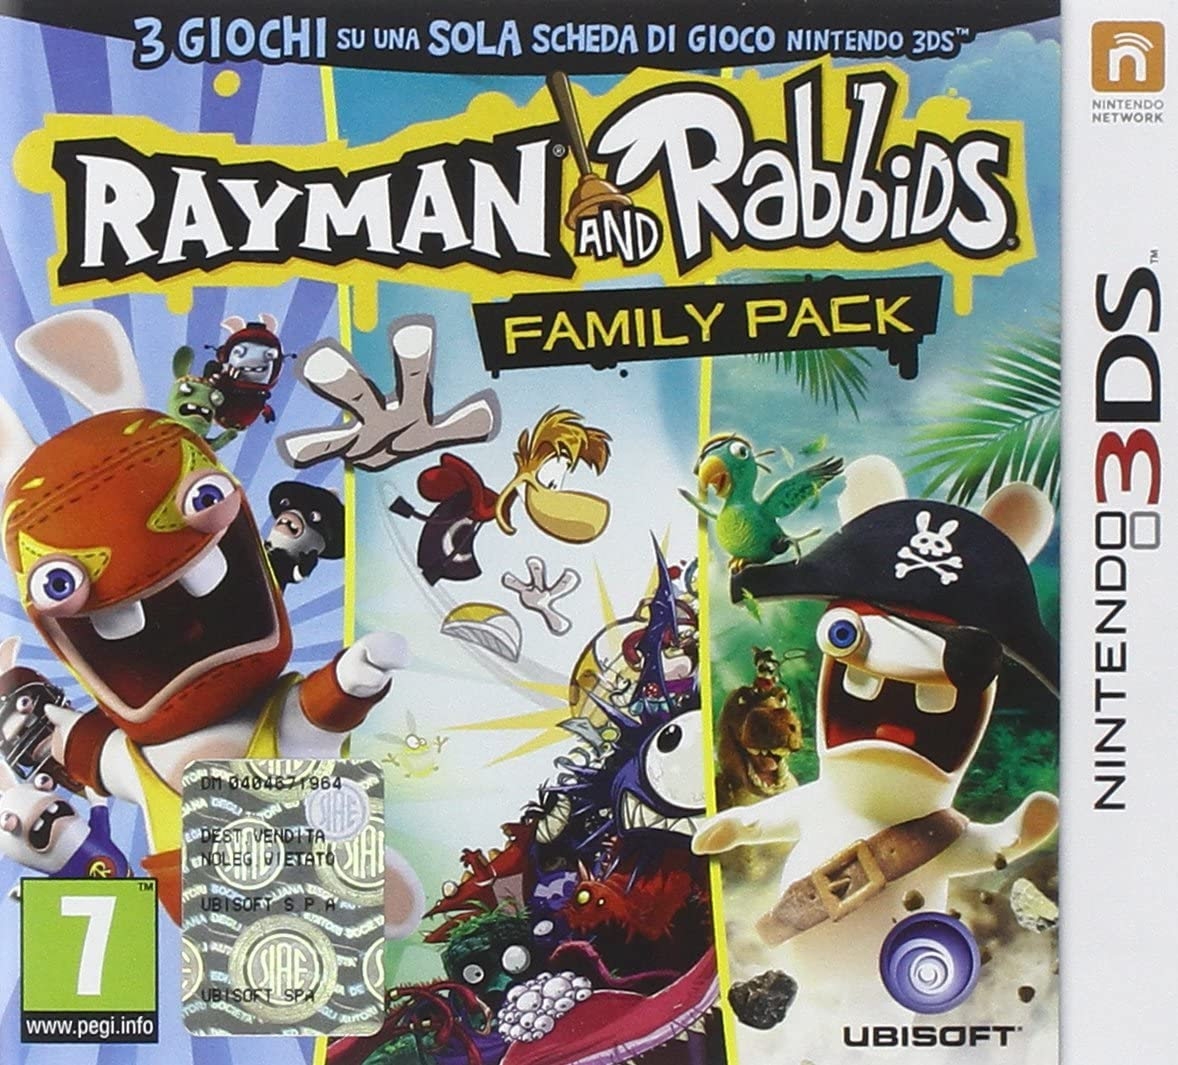 Ubisoft Rayman and Rabbids Family Pack, Nintendo 3DS - Juego (Nintendo 3DS, Nintendo 3DS, Acción / Aventura, E (para todos)): Amazon.es: Videojuegos